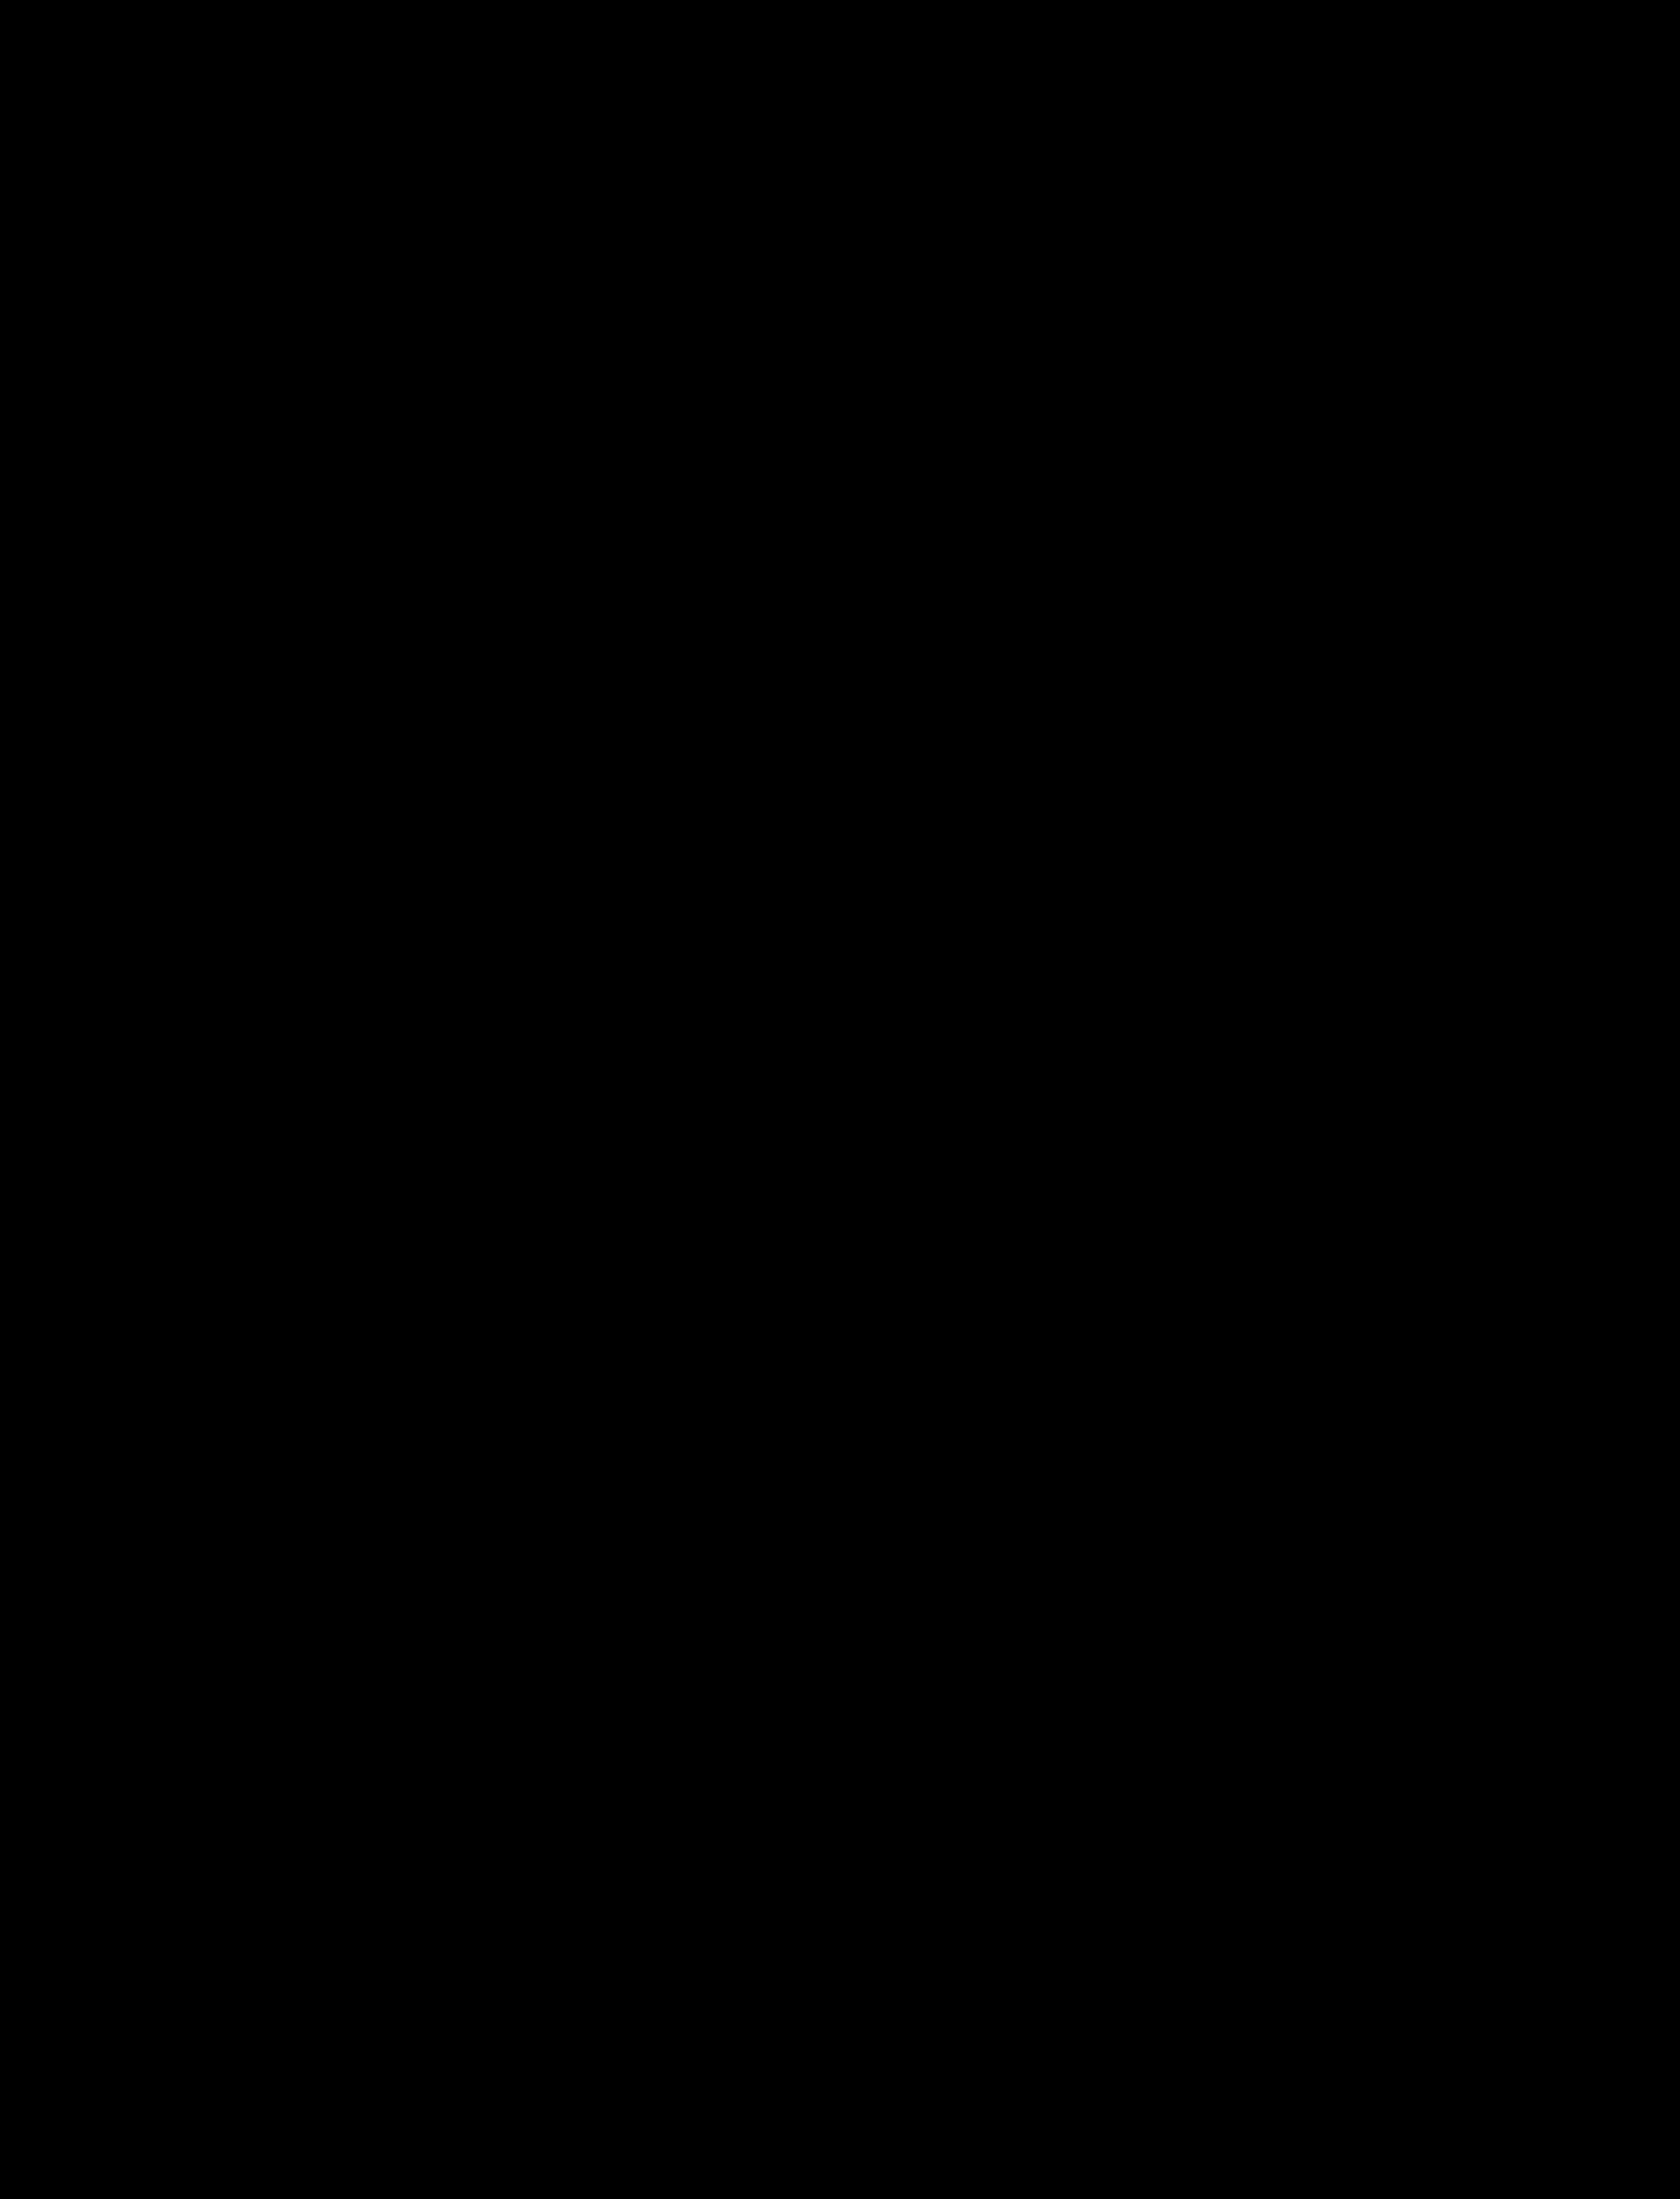 graduate silhouette clipart - HD1834×2400